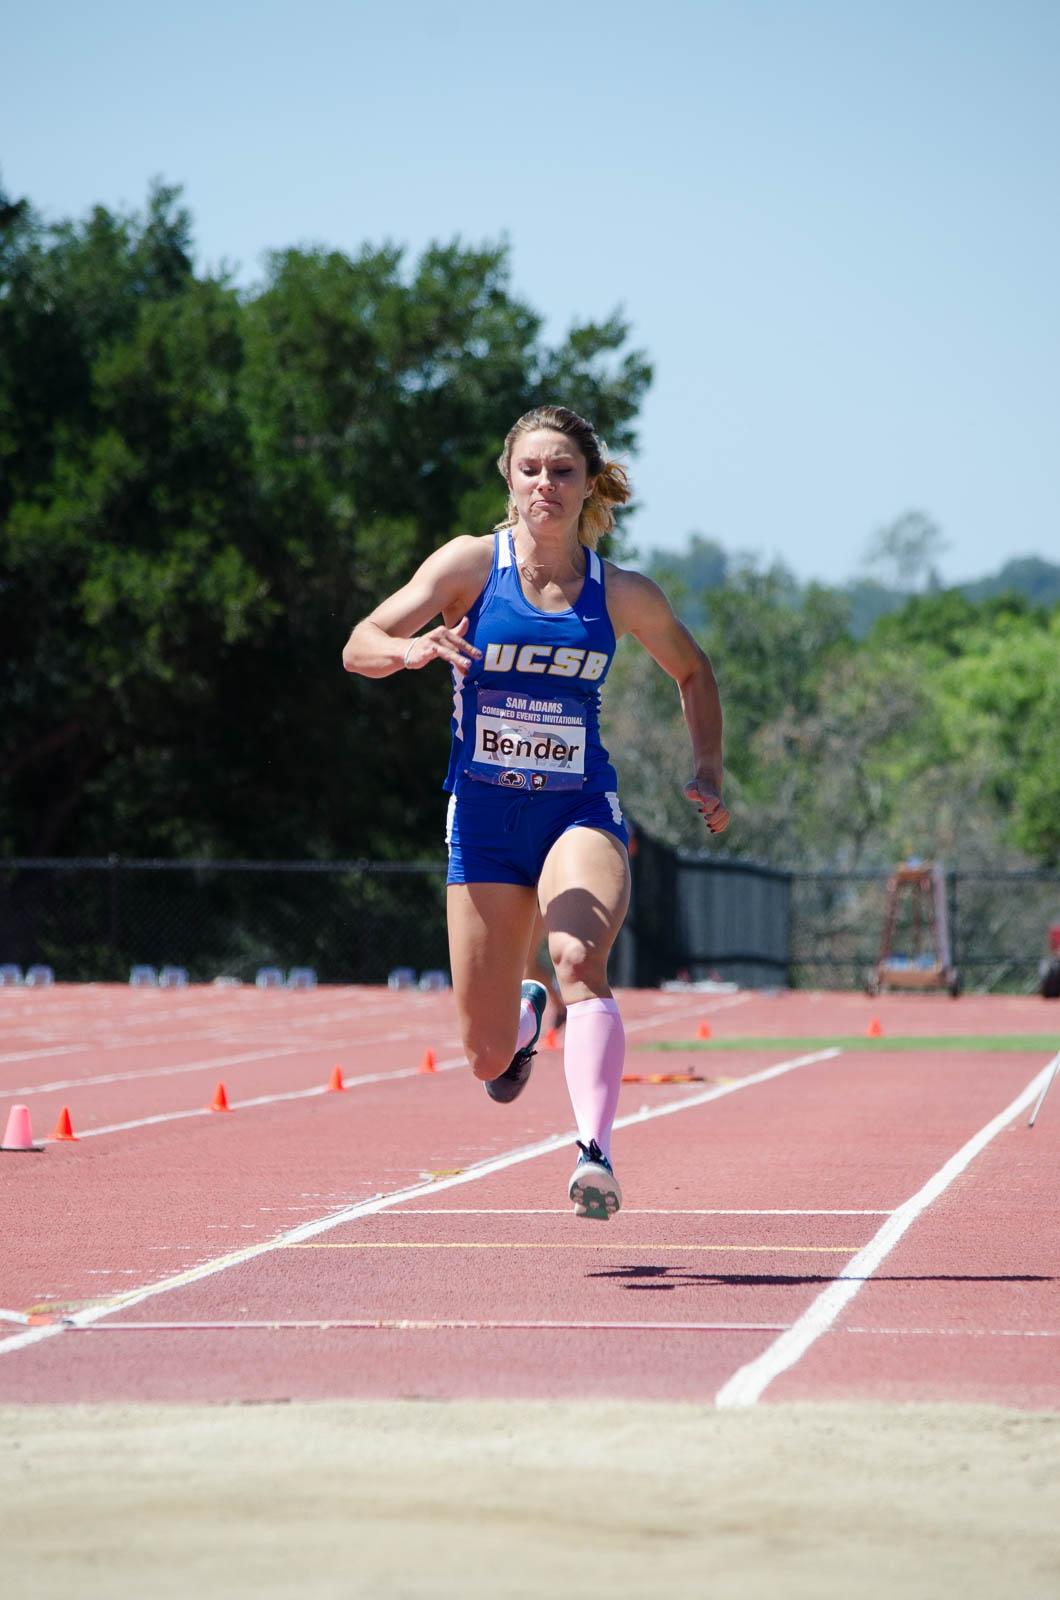 Preparing to jump, Hope Bender runs towards the sand. Christina DeMarzo / Daily Nexus